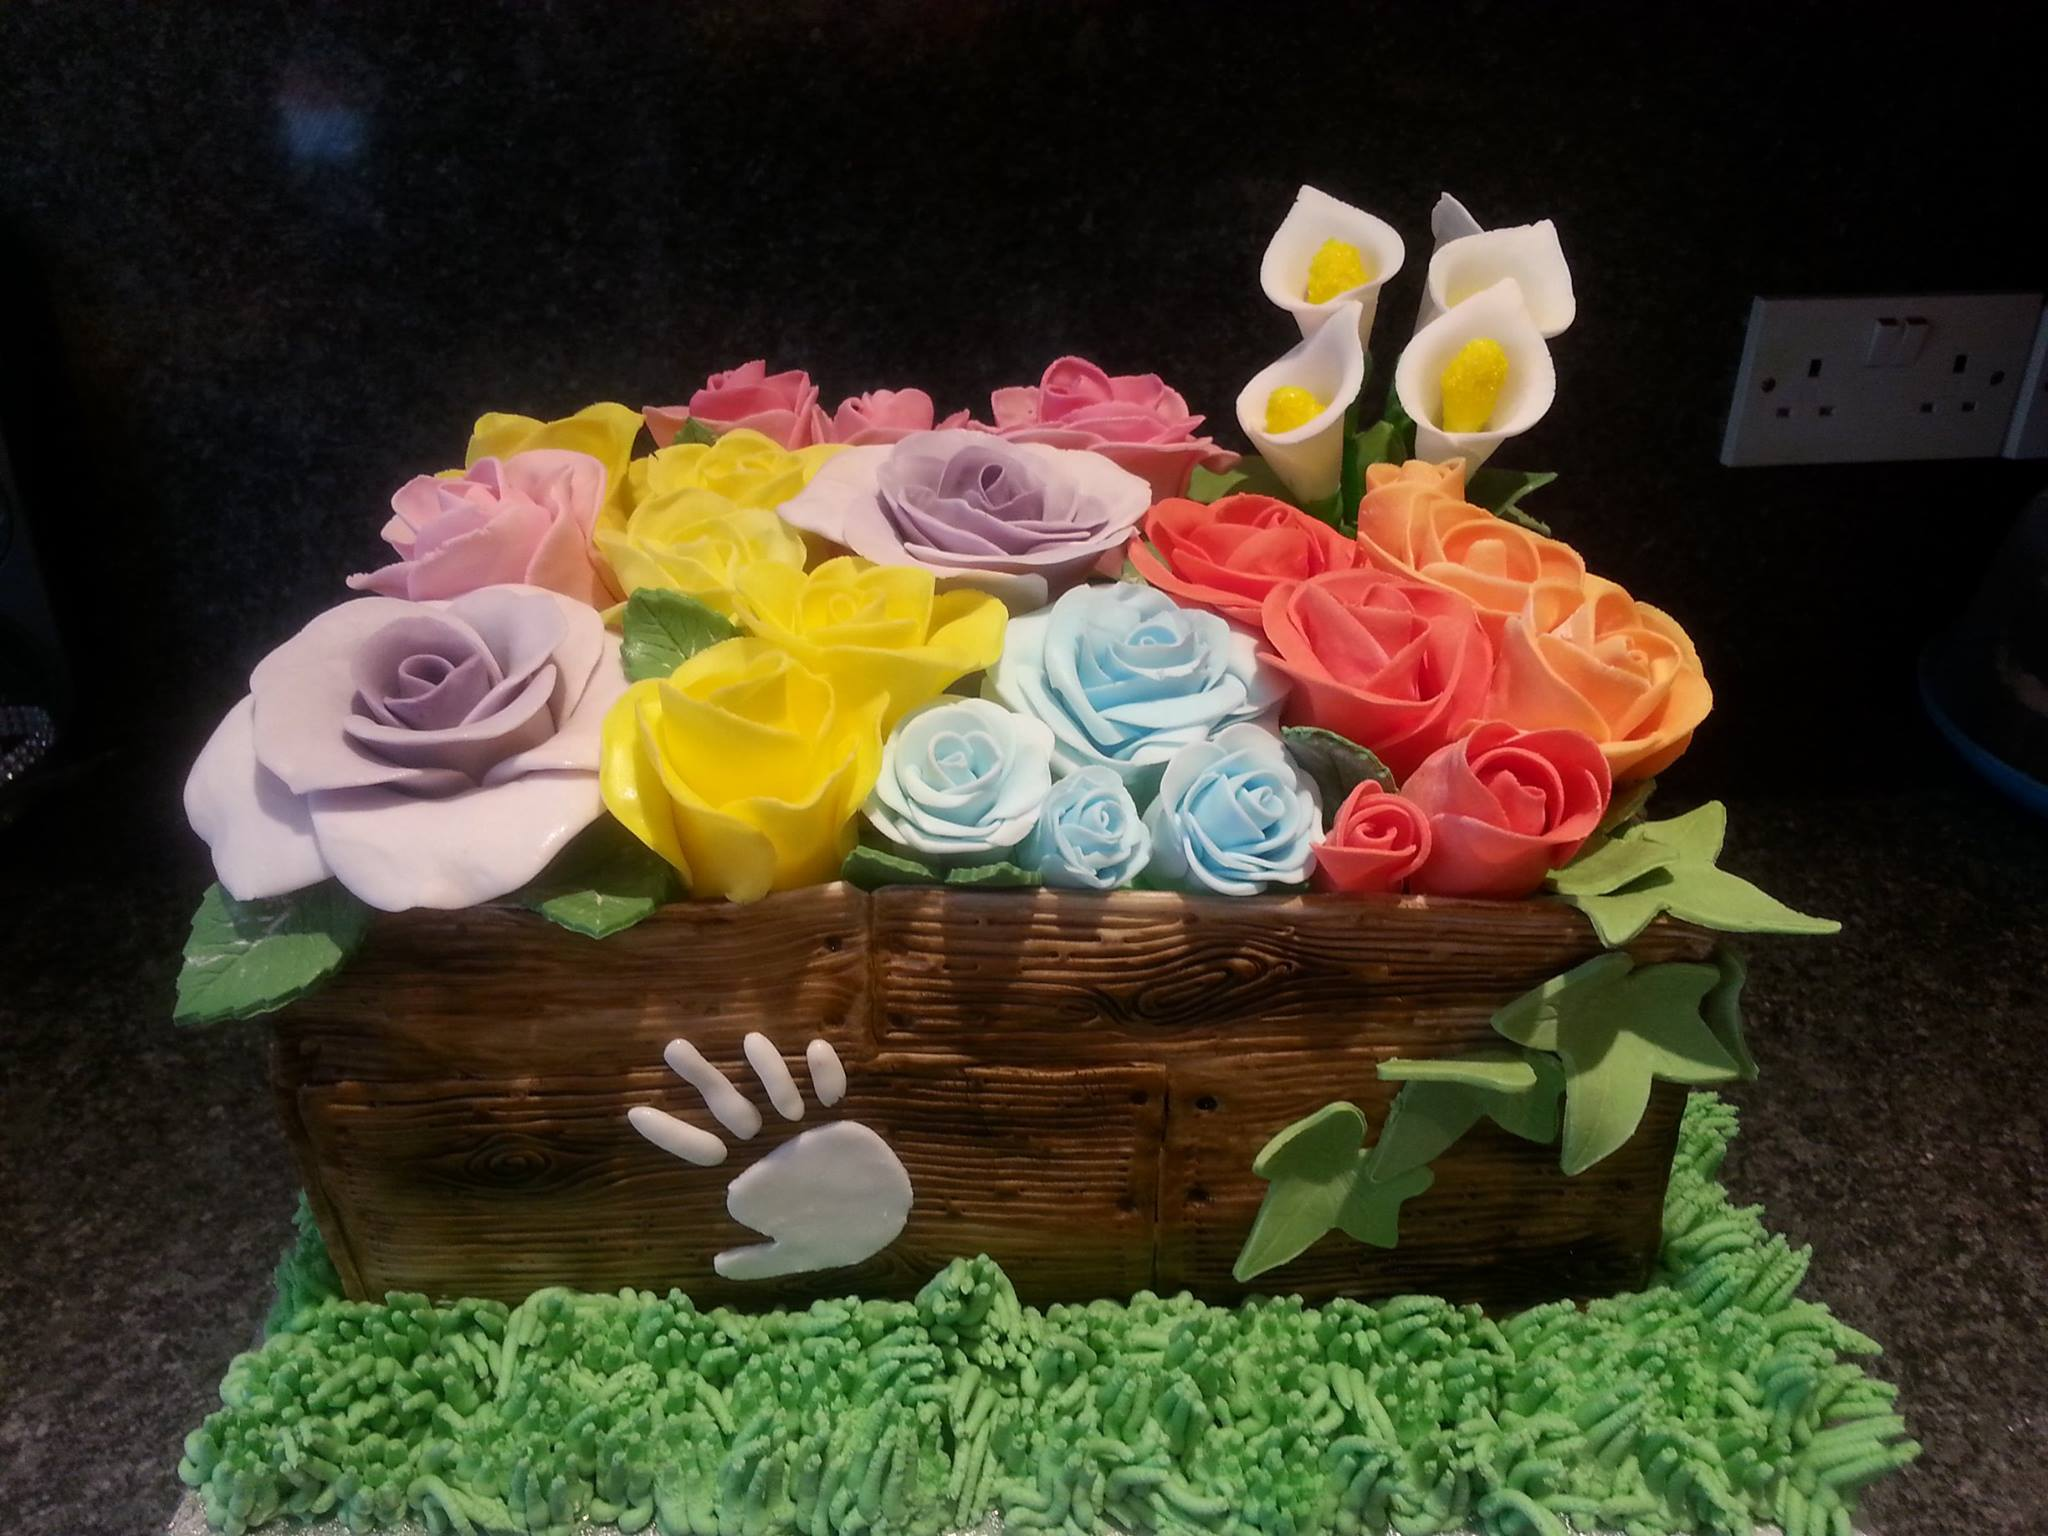 A box of flowers.jpg